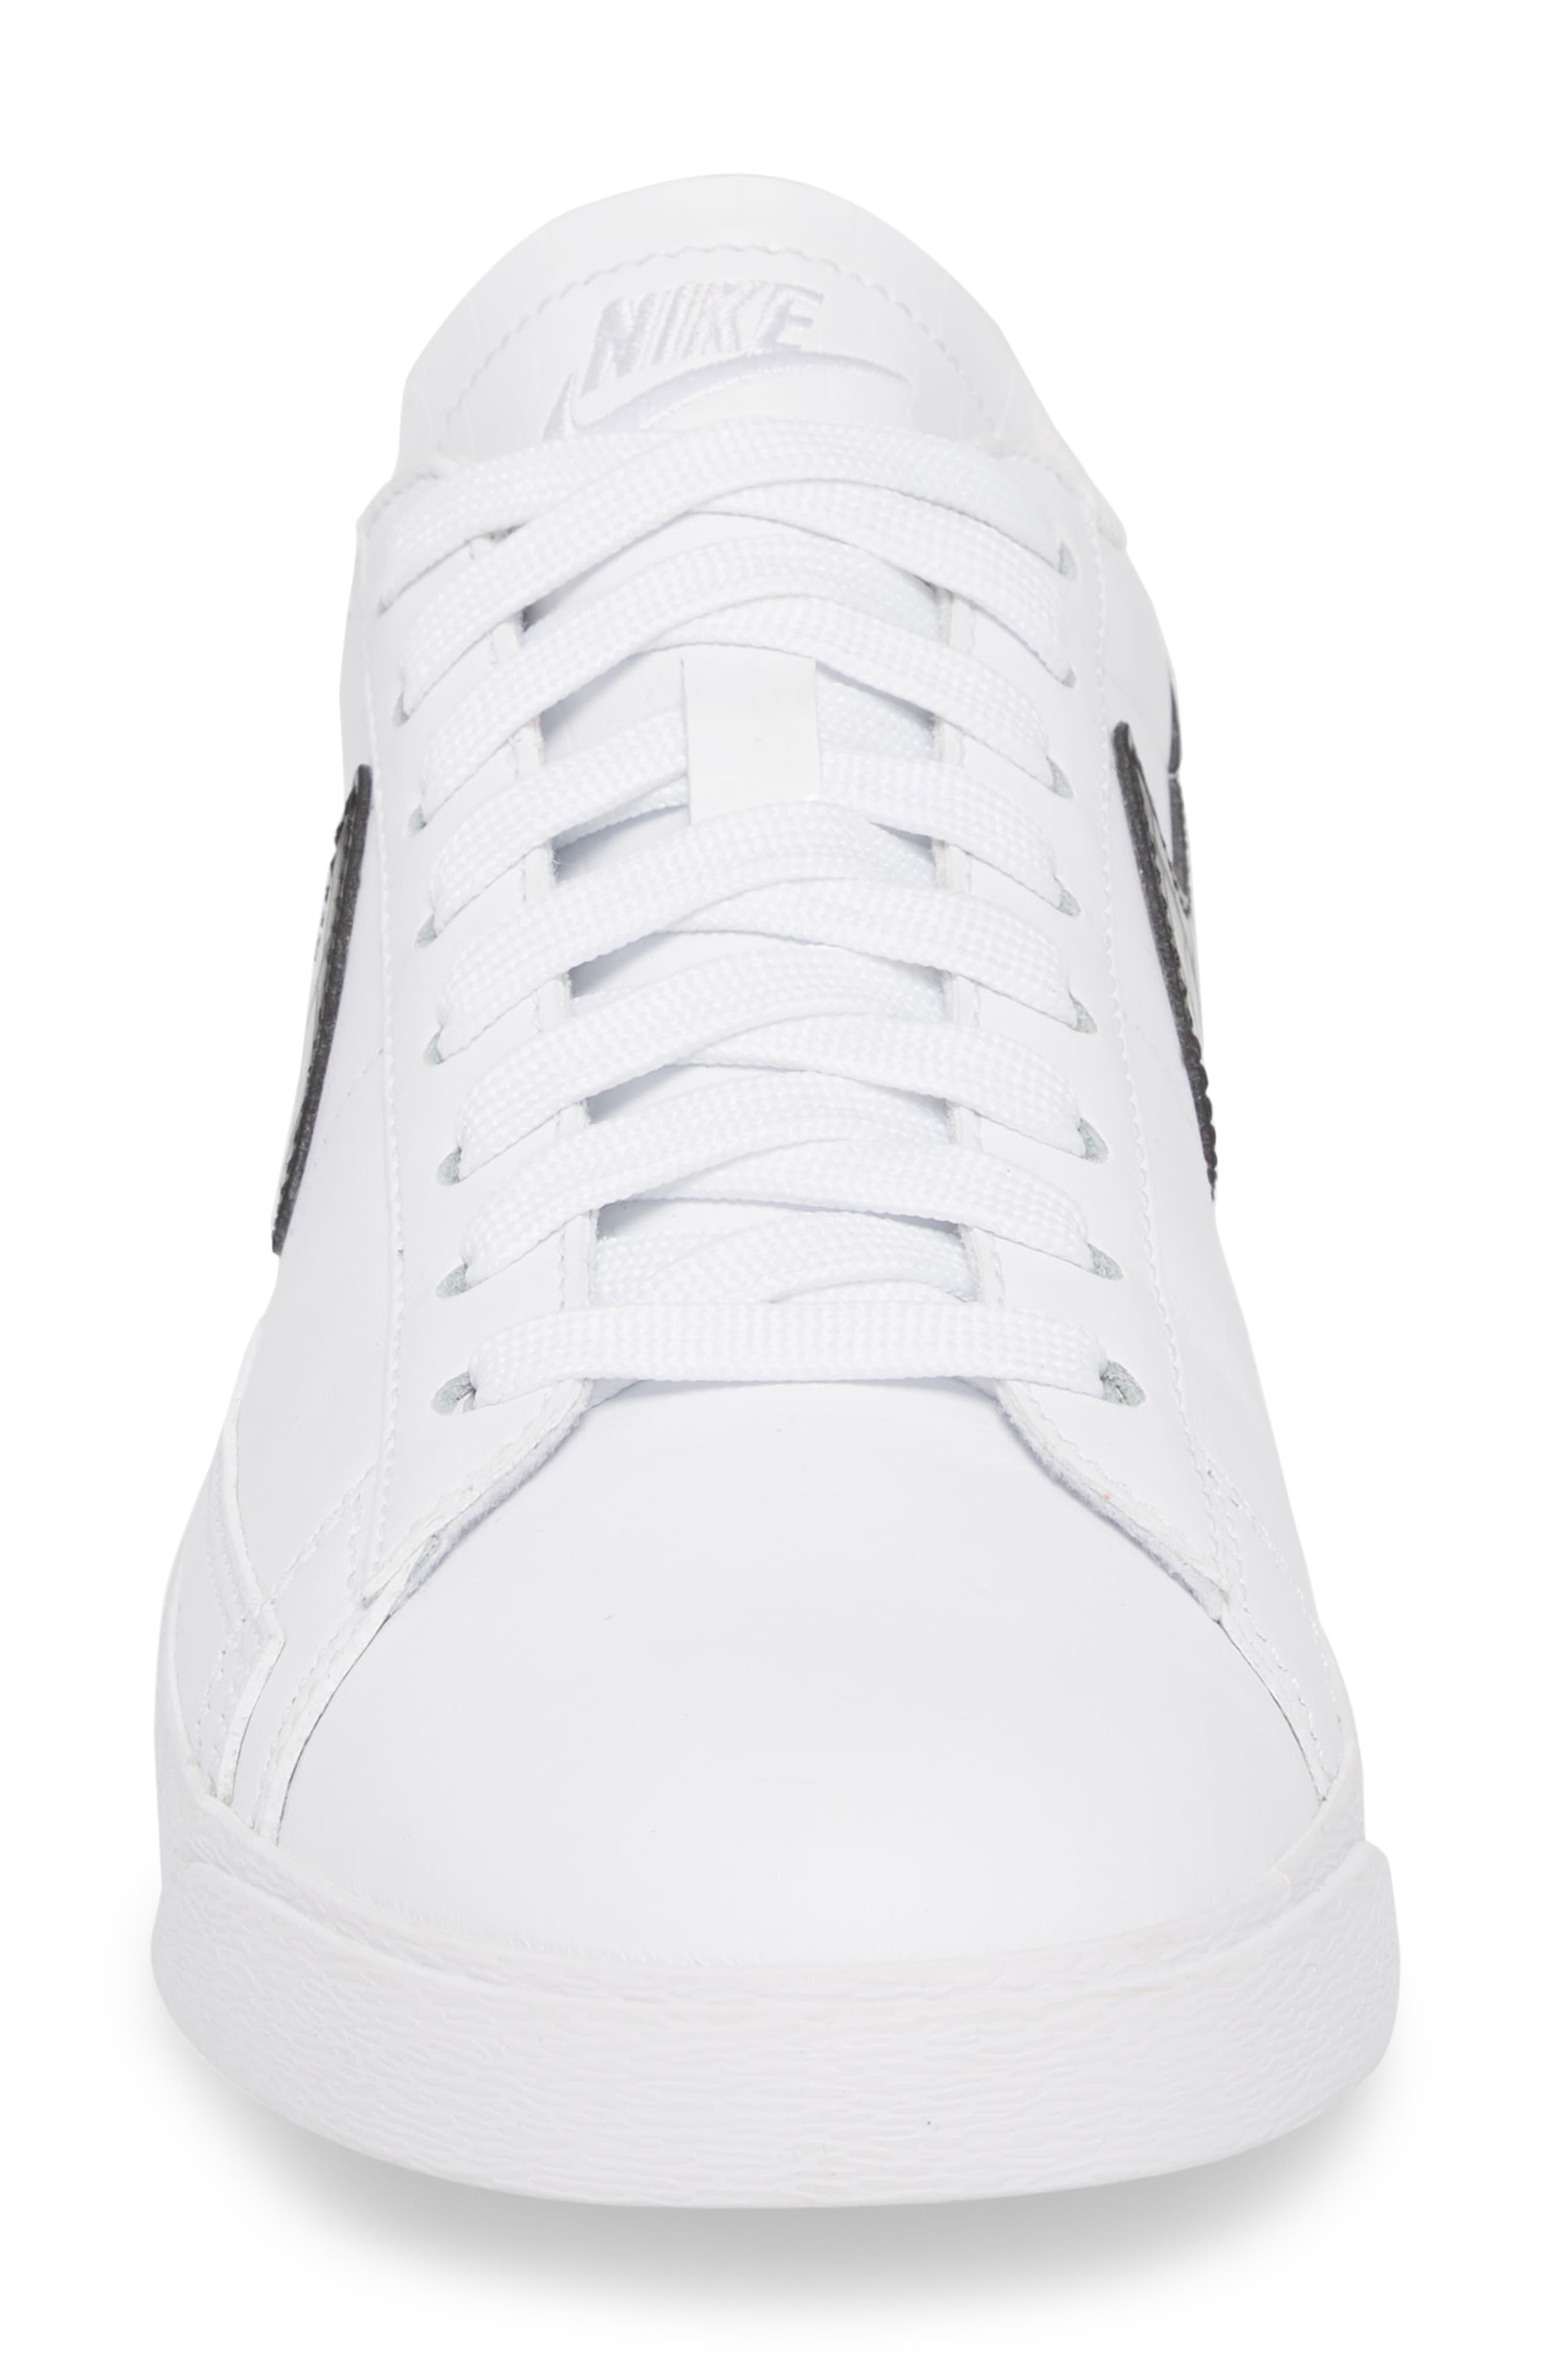 Blazer Low Essential Sneaker,                             Alternate thumbnail 4, color,                             100